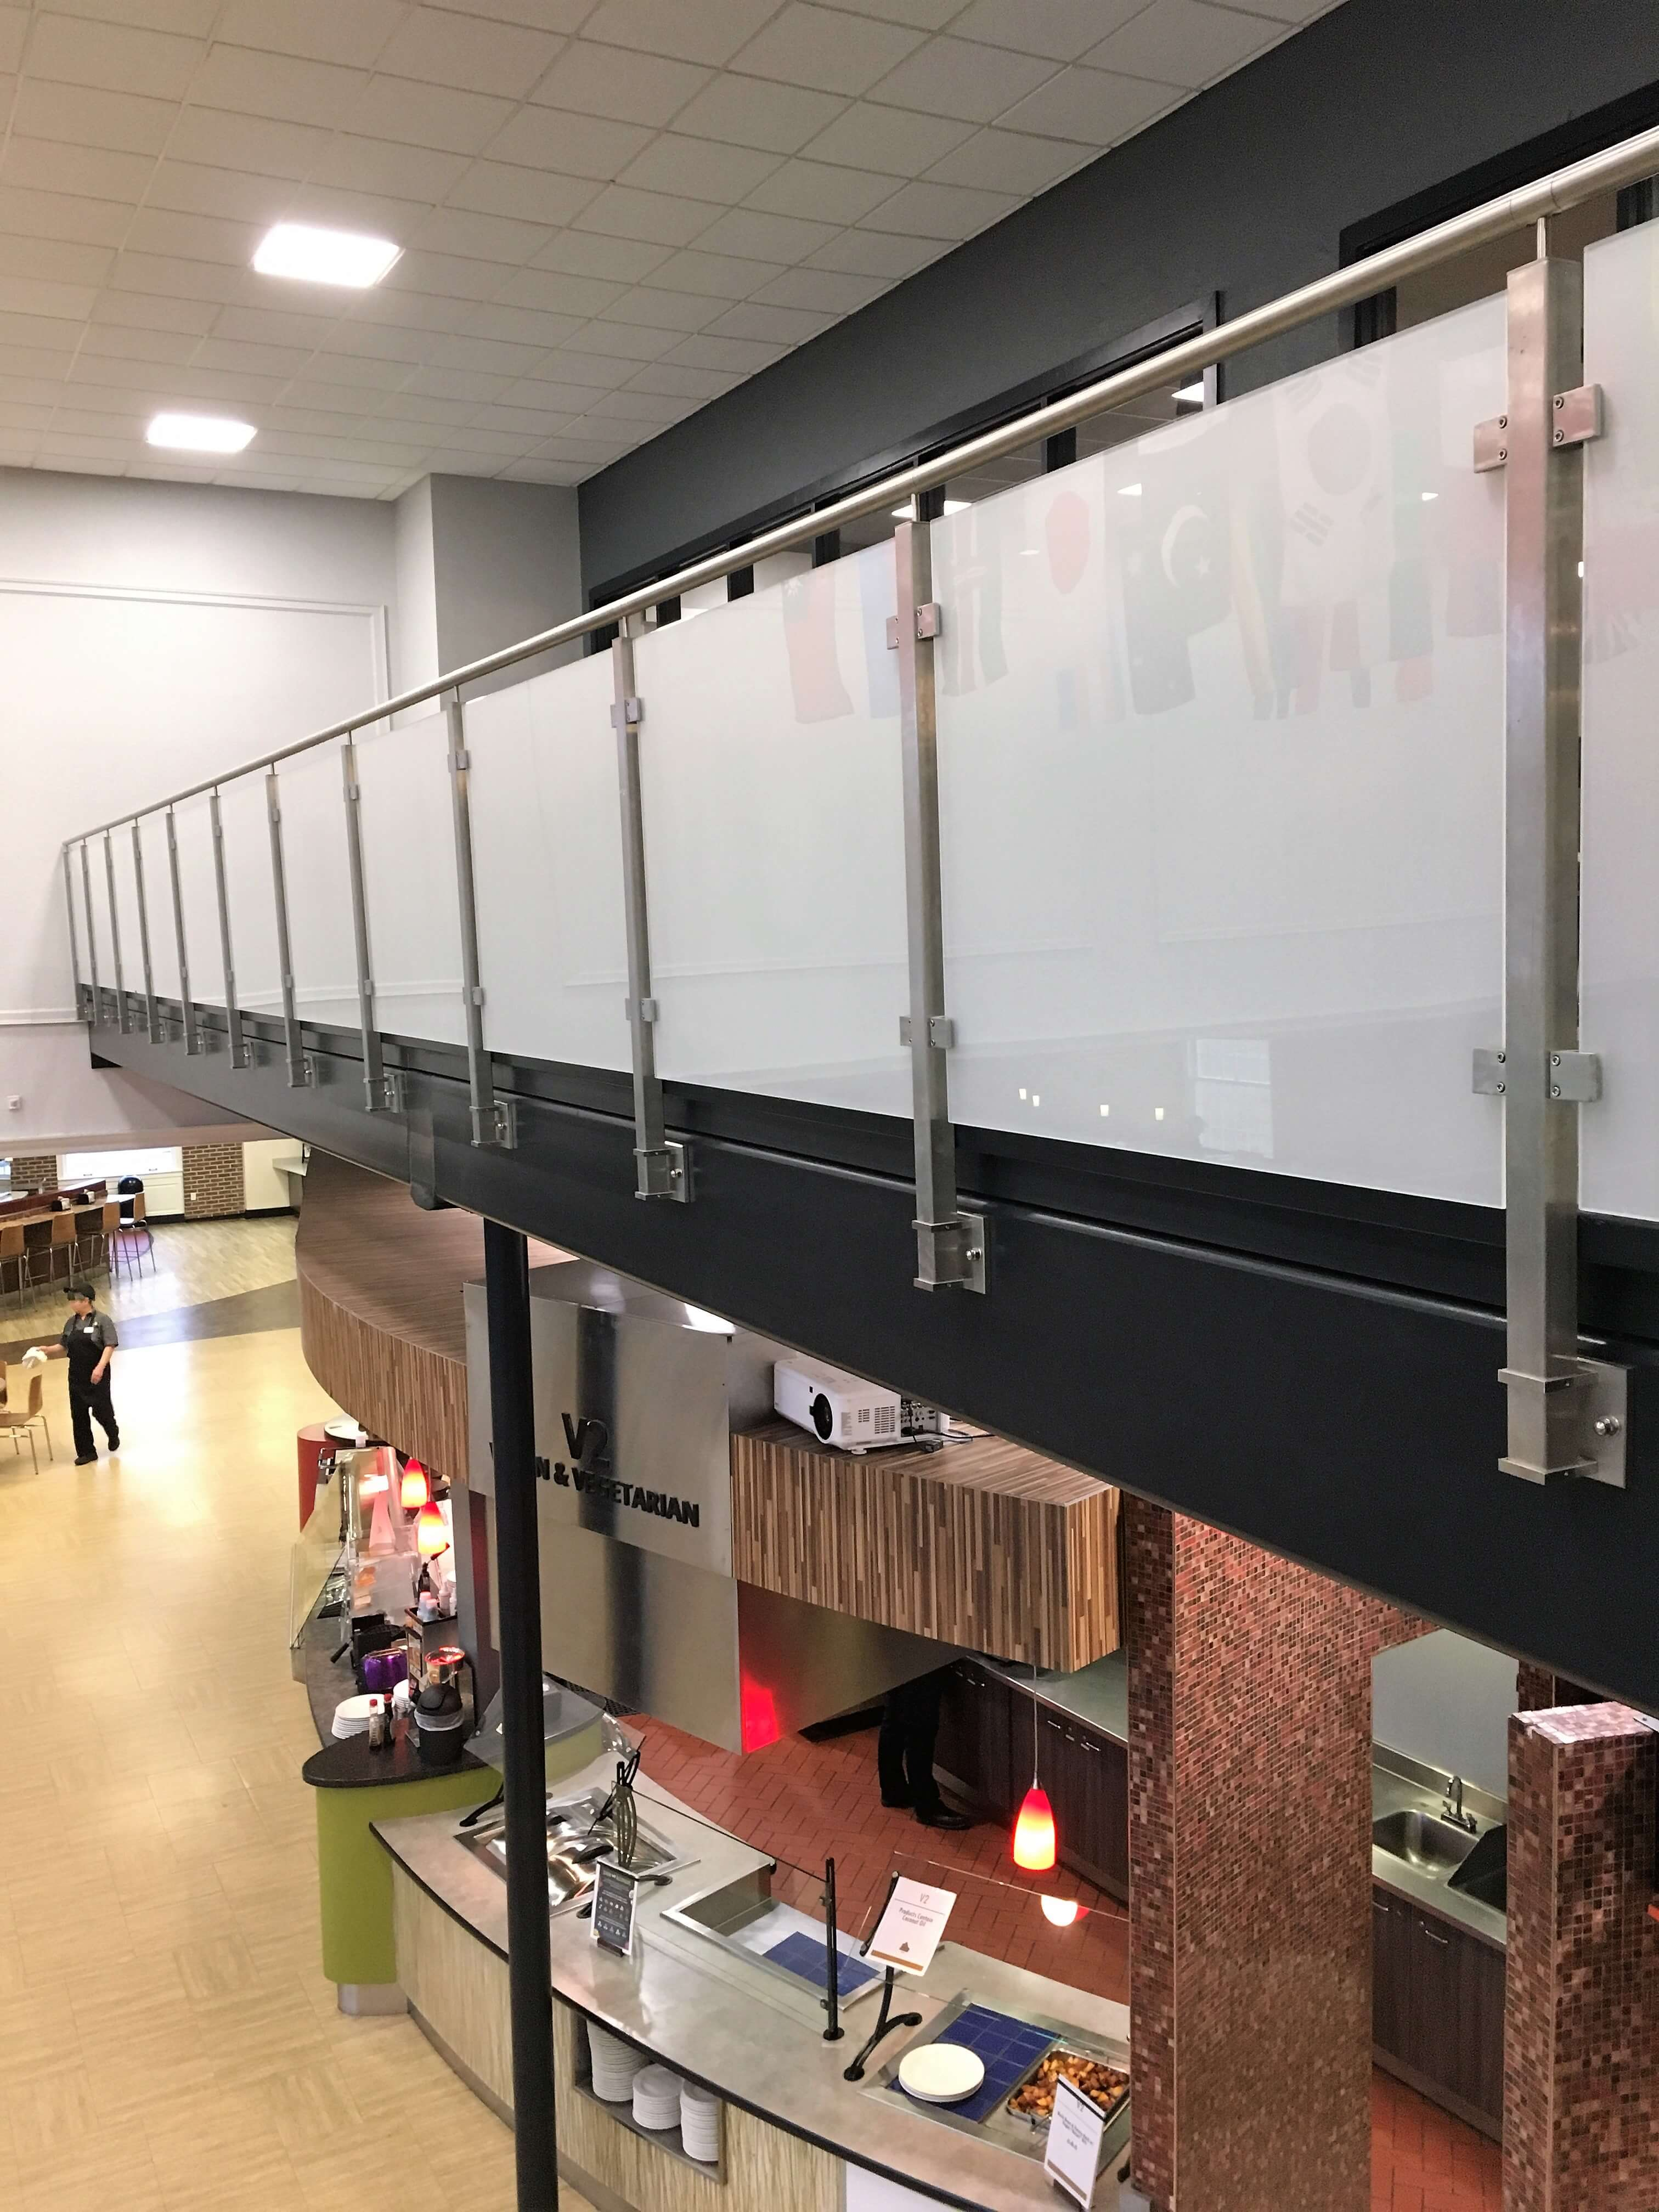 Kubit Glass Railing At Market Axess Nyc: CIRCUM™ Square Photo Gallery